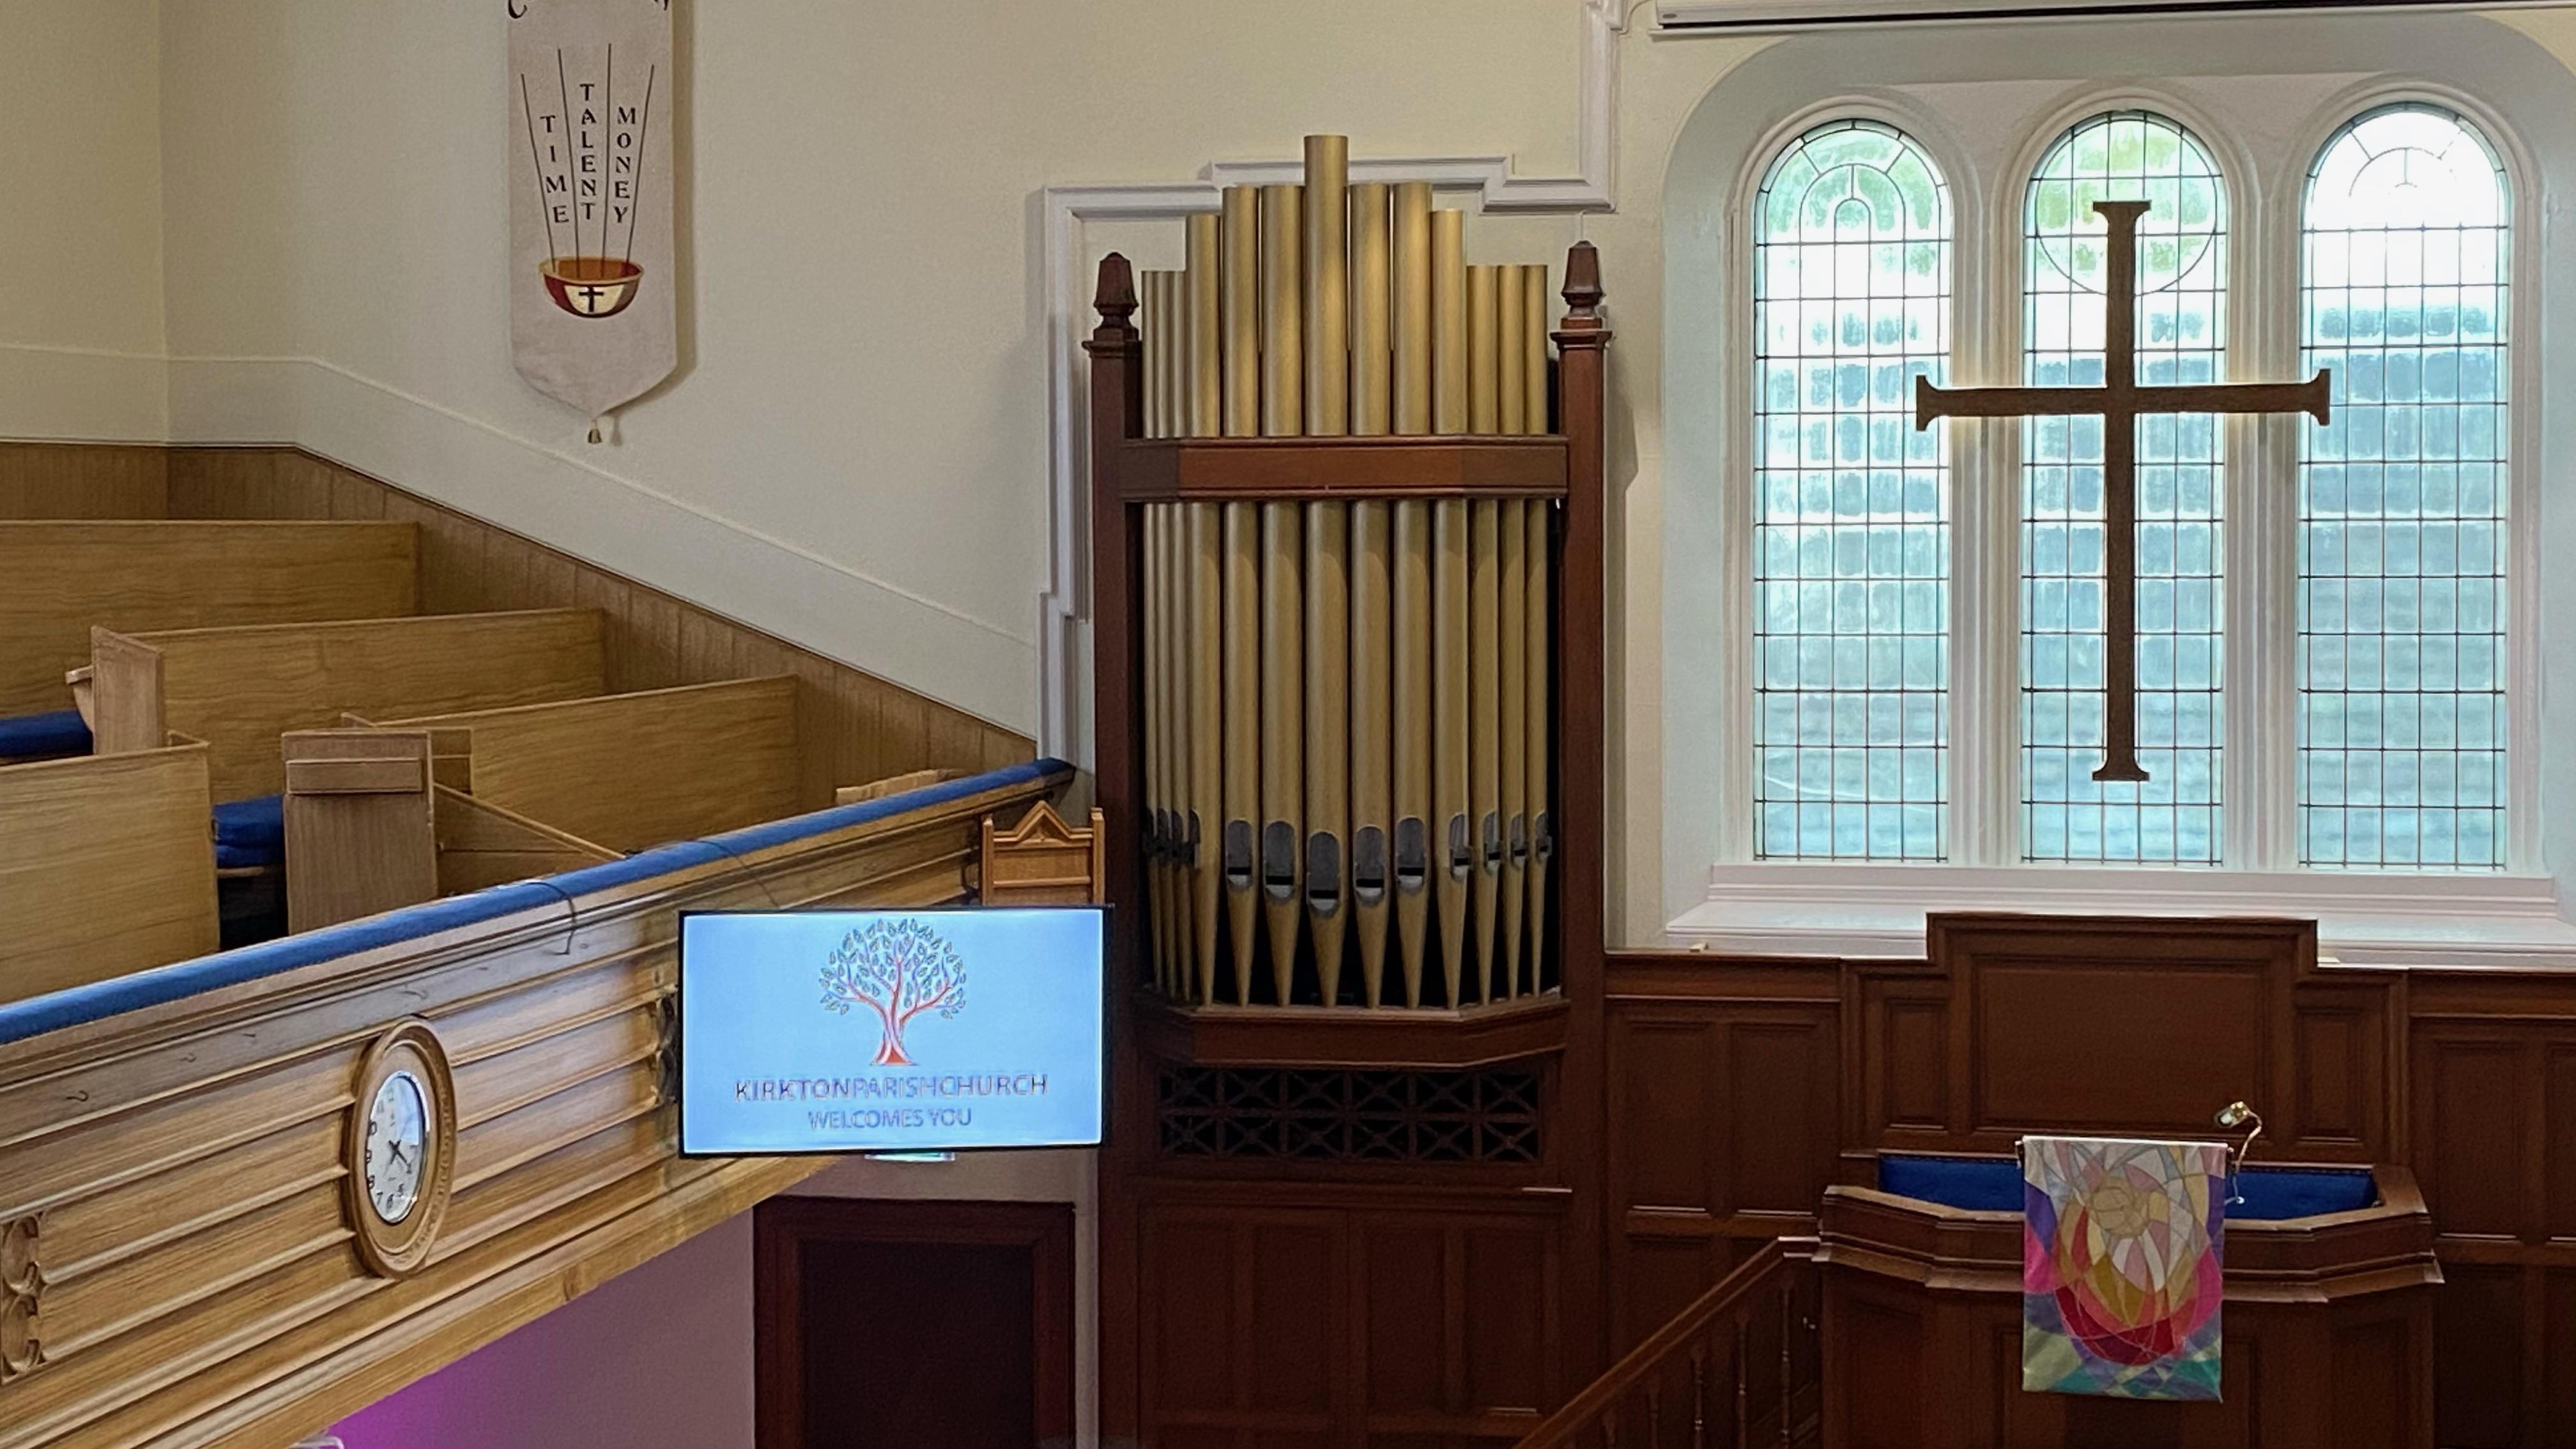 Kirkton Church Sanctuary - New Screens 4